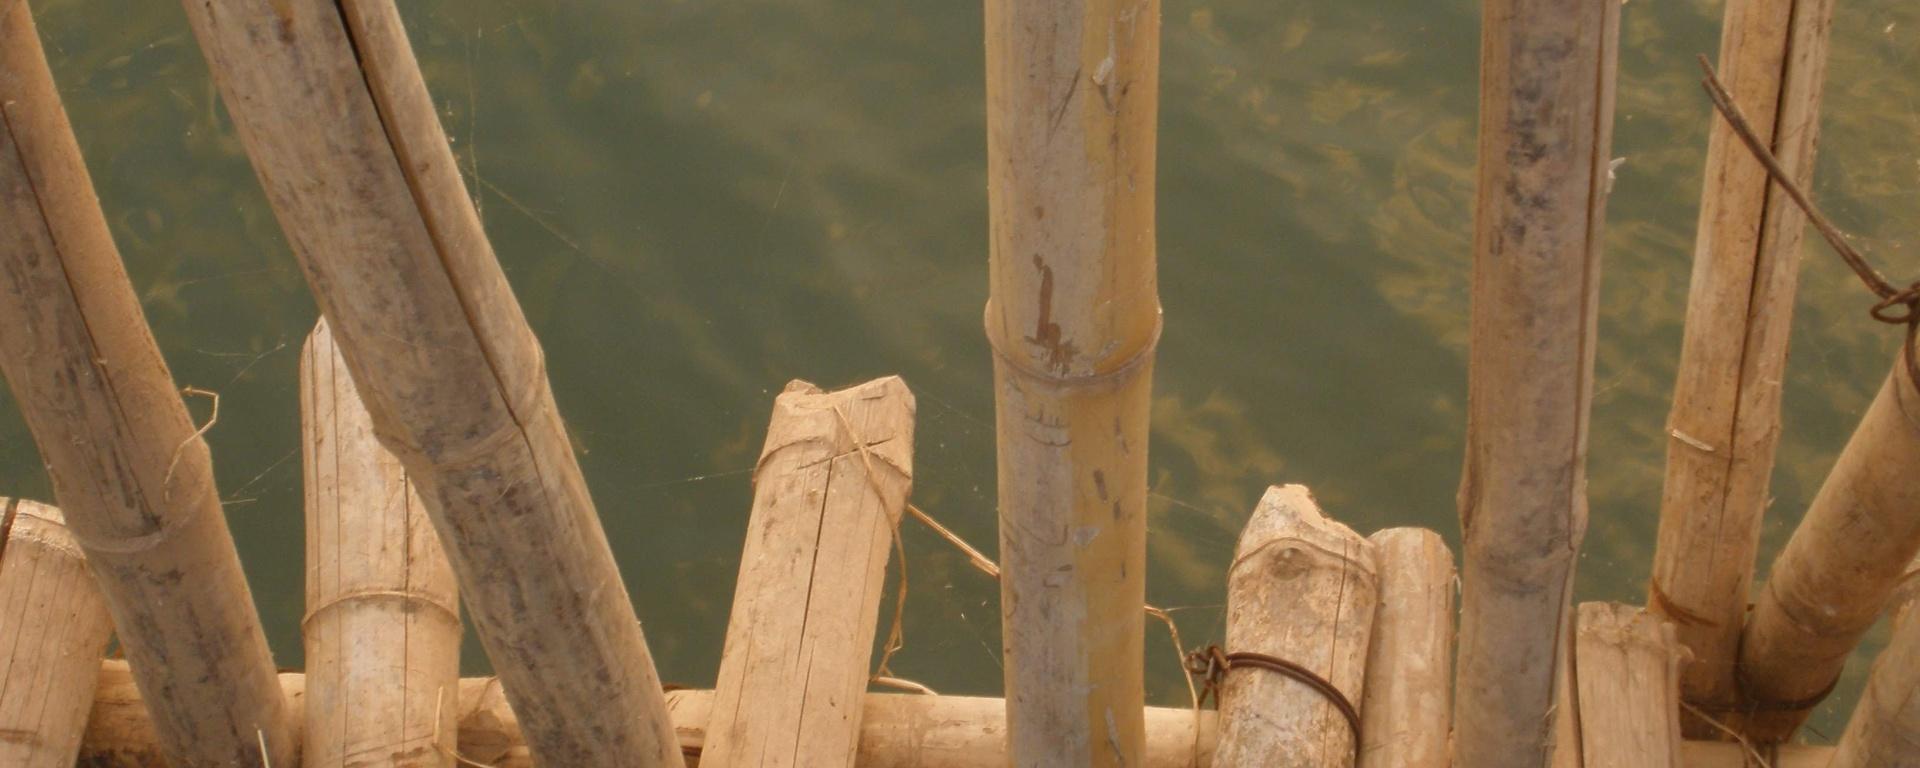 Mekong River, Cambodia